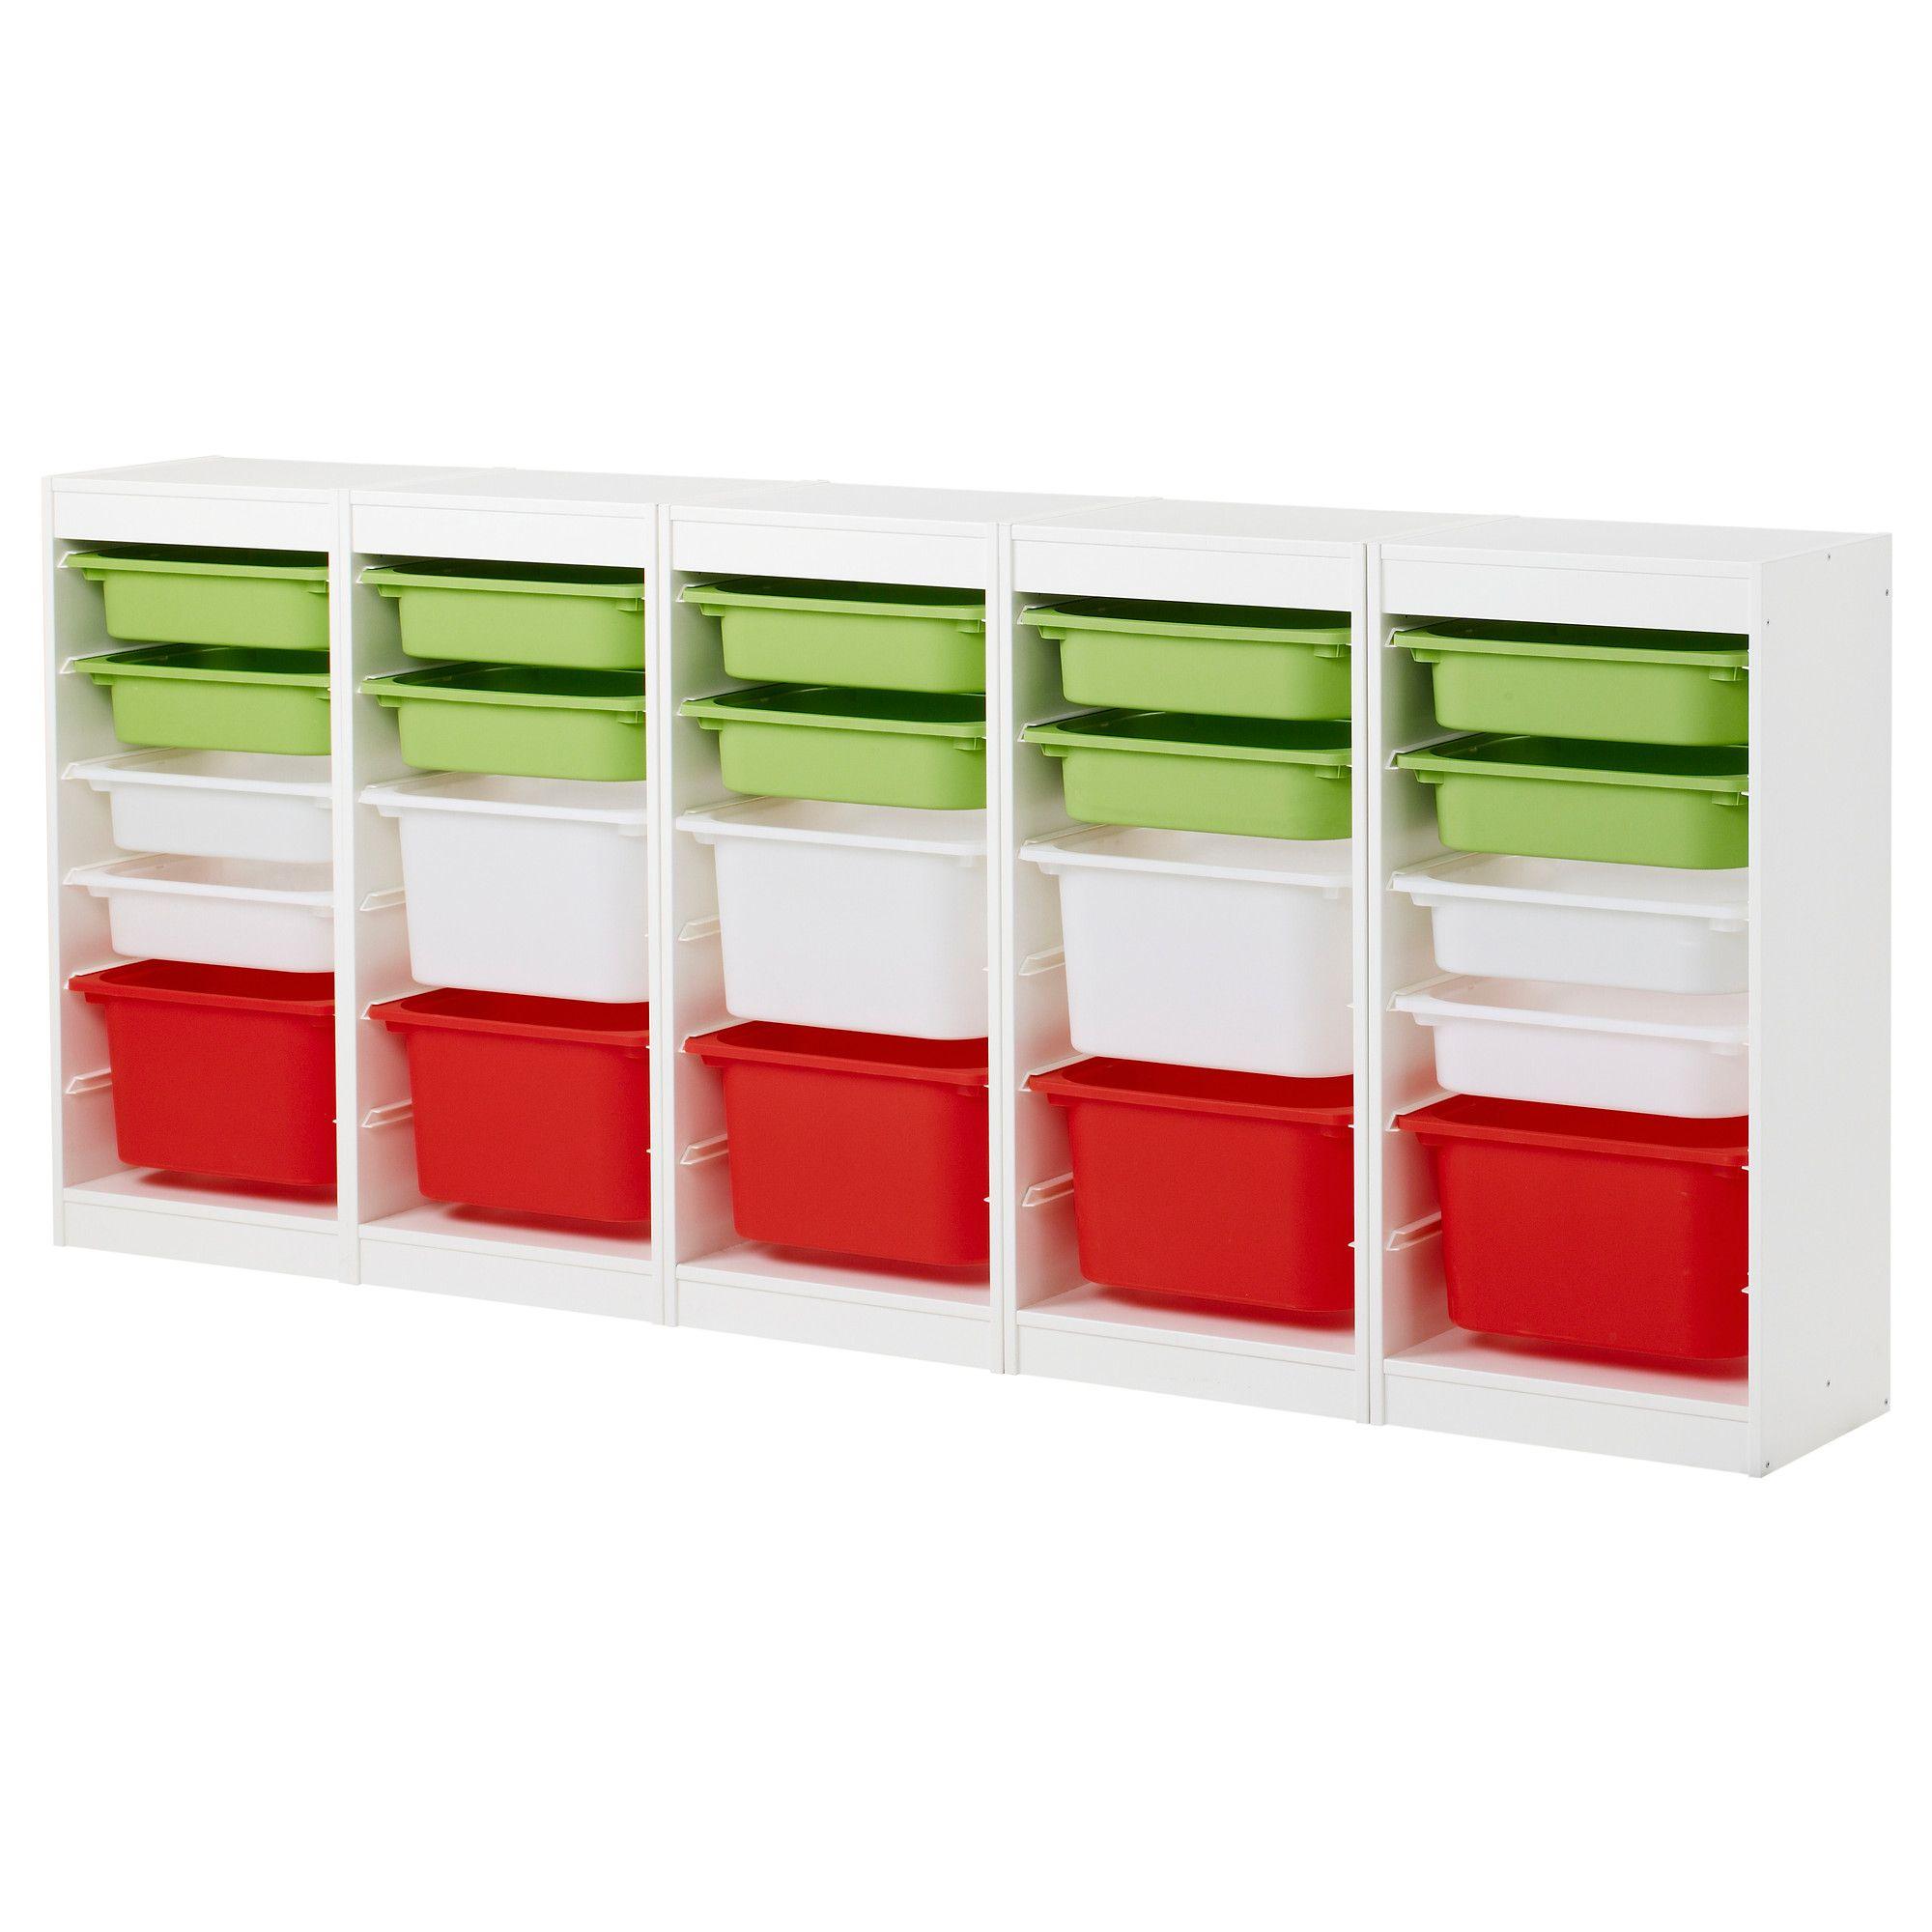 Us Furniture And Home Furnishings Childrens Storage